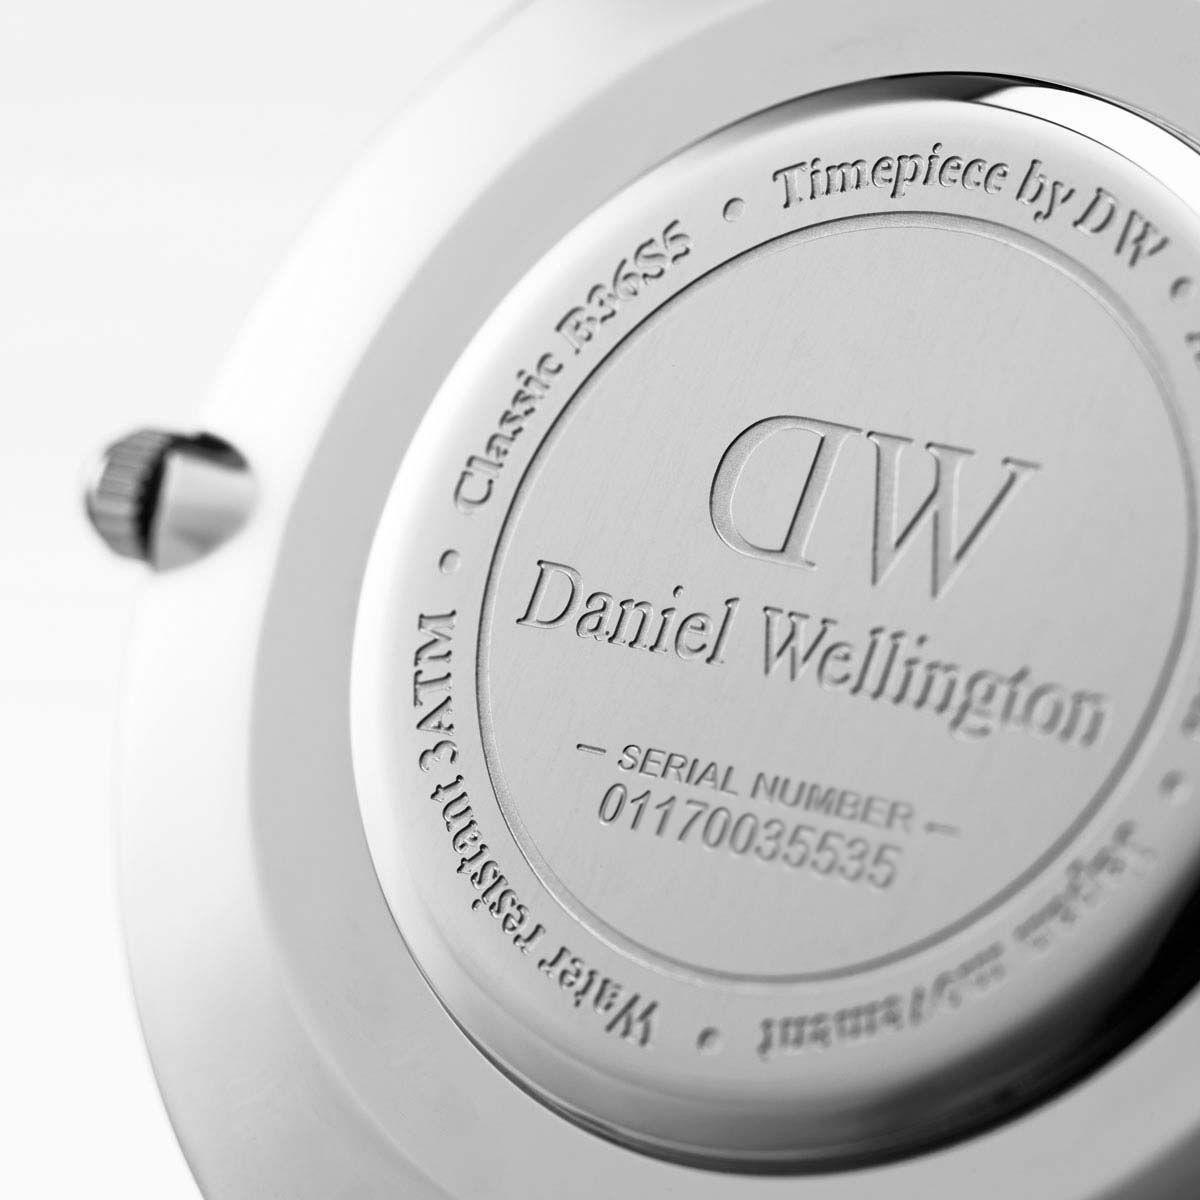 dw官网 dw手表官网 dw中国官网 dw官方旗舰店 DW DW官网  W Classic Black Cornwall Silver 40mm